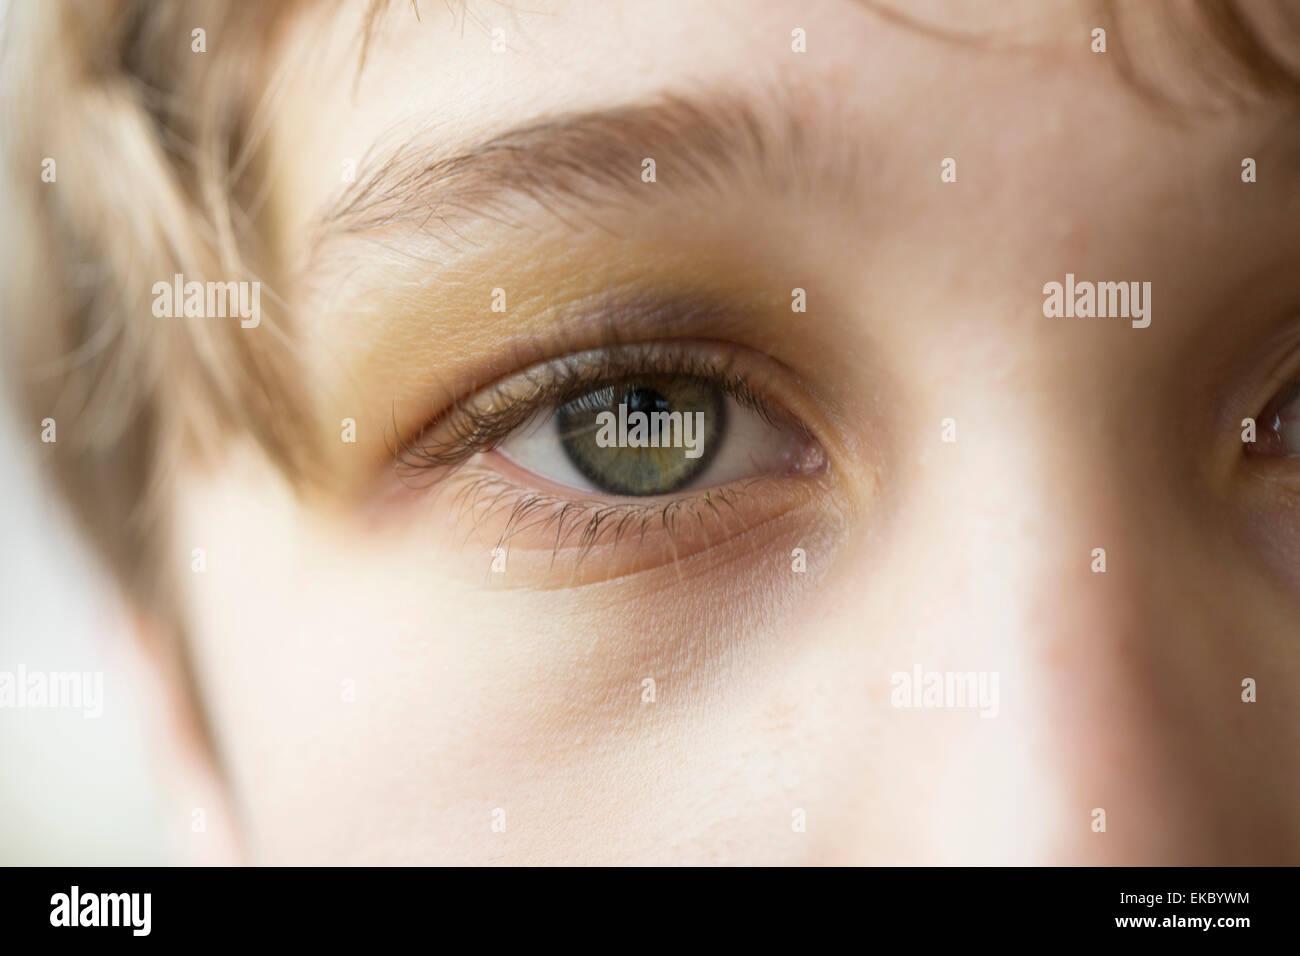 Close up of boy's eye - Stock Image